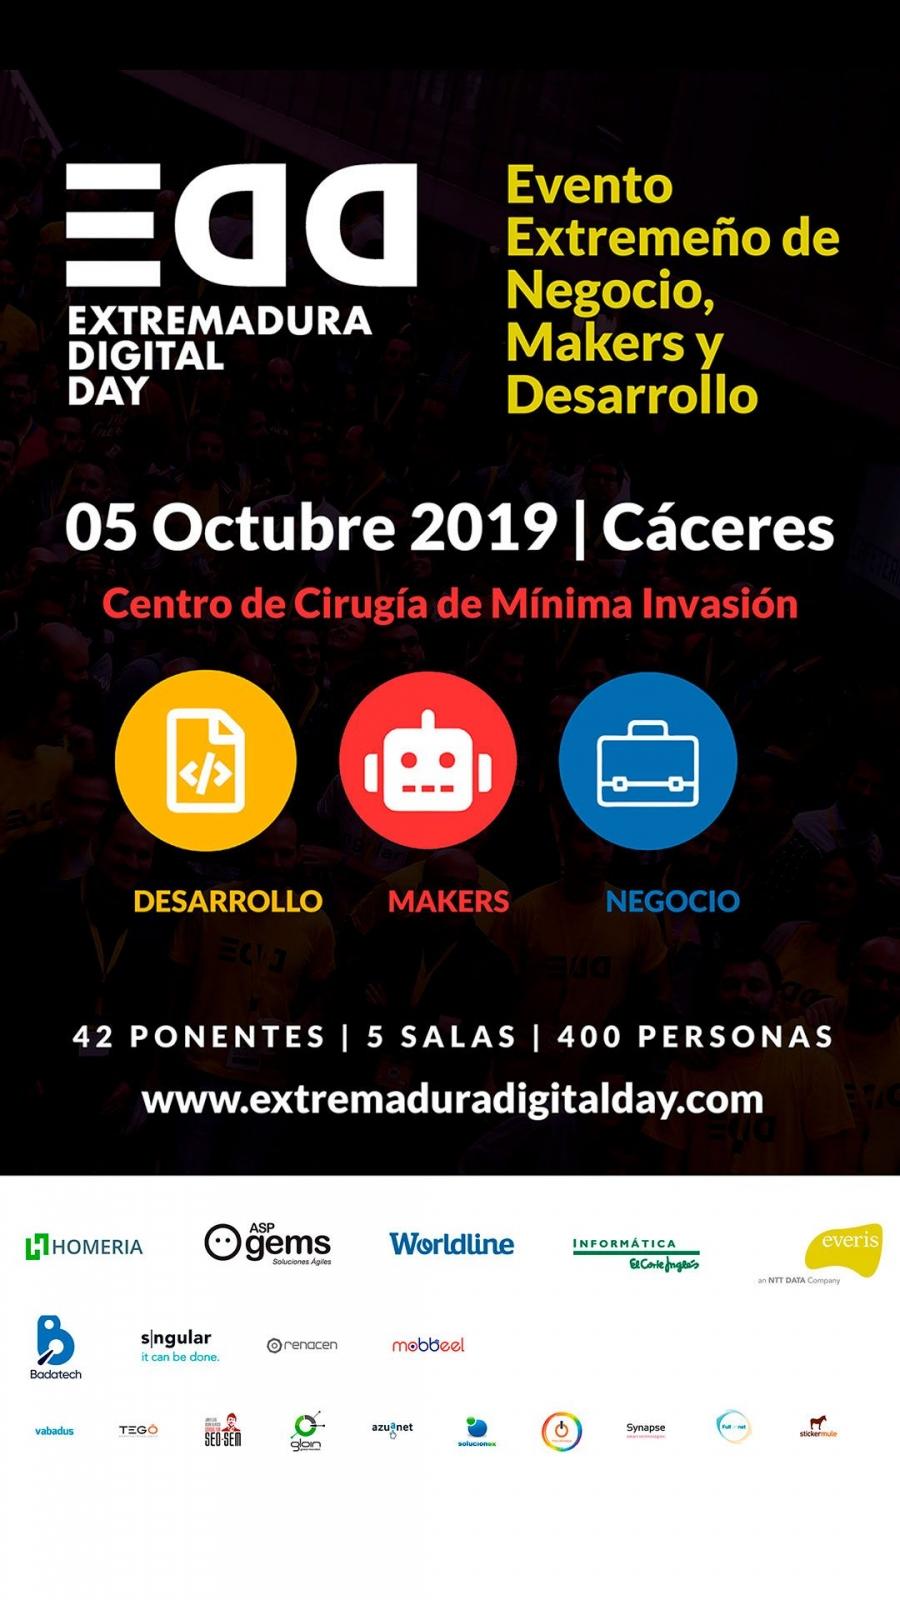 Extremadura Digital Day 2019